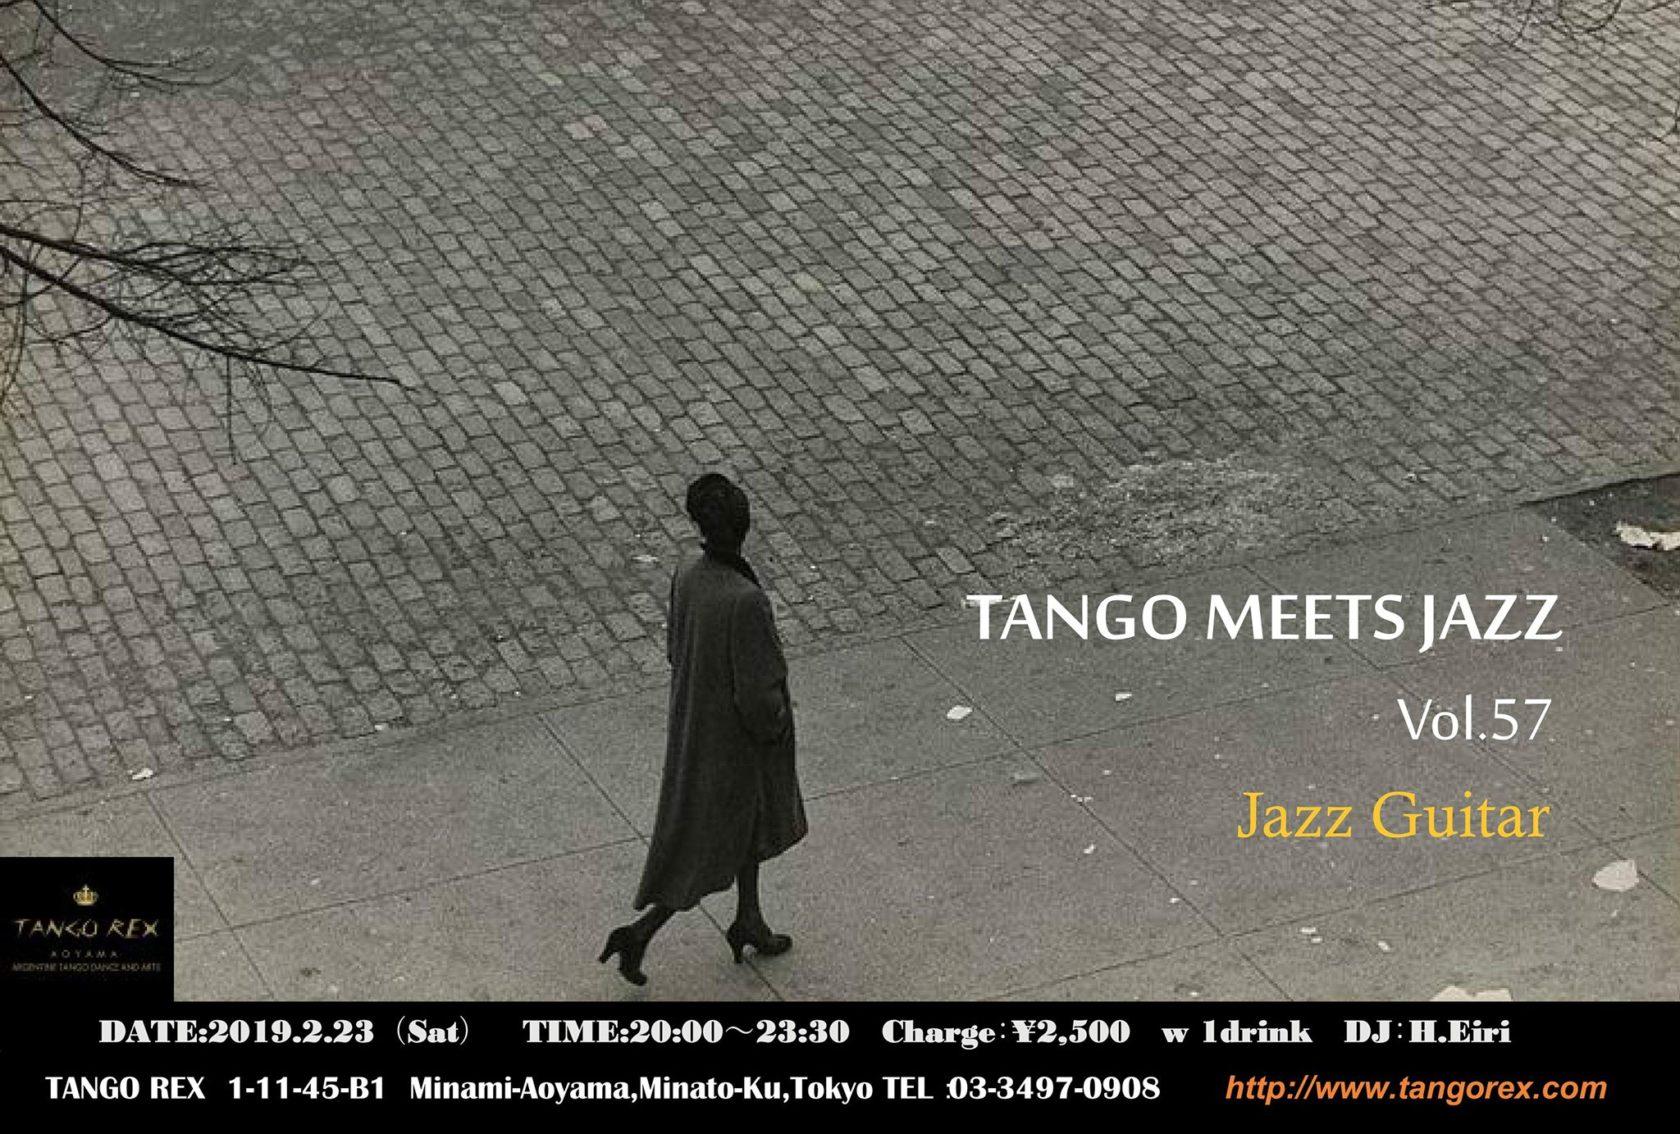 2/23 Tango Meets Jazz vol.57